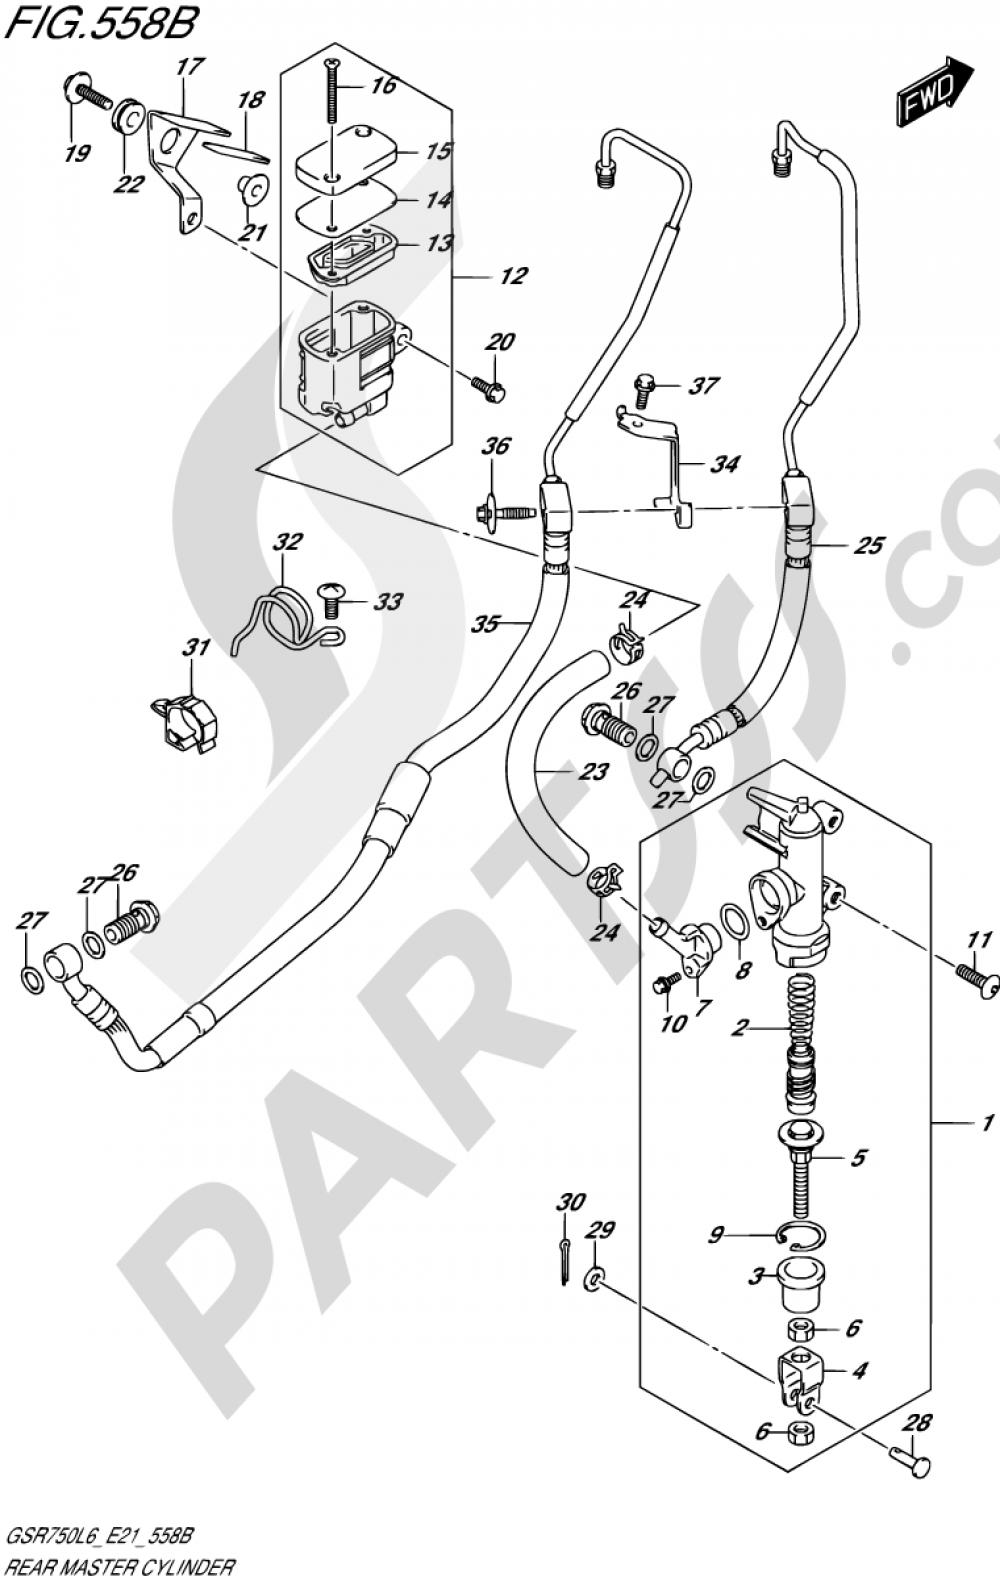 558B - REAR MASTER CYLINDER (GSR750AL6 E21) Suzuki GSR750A 2016